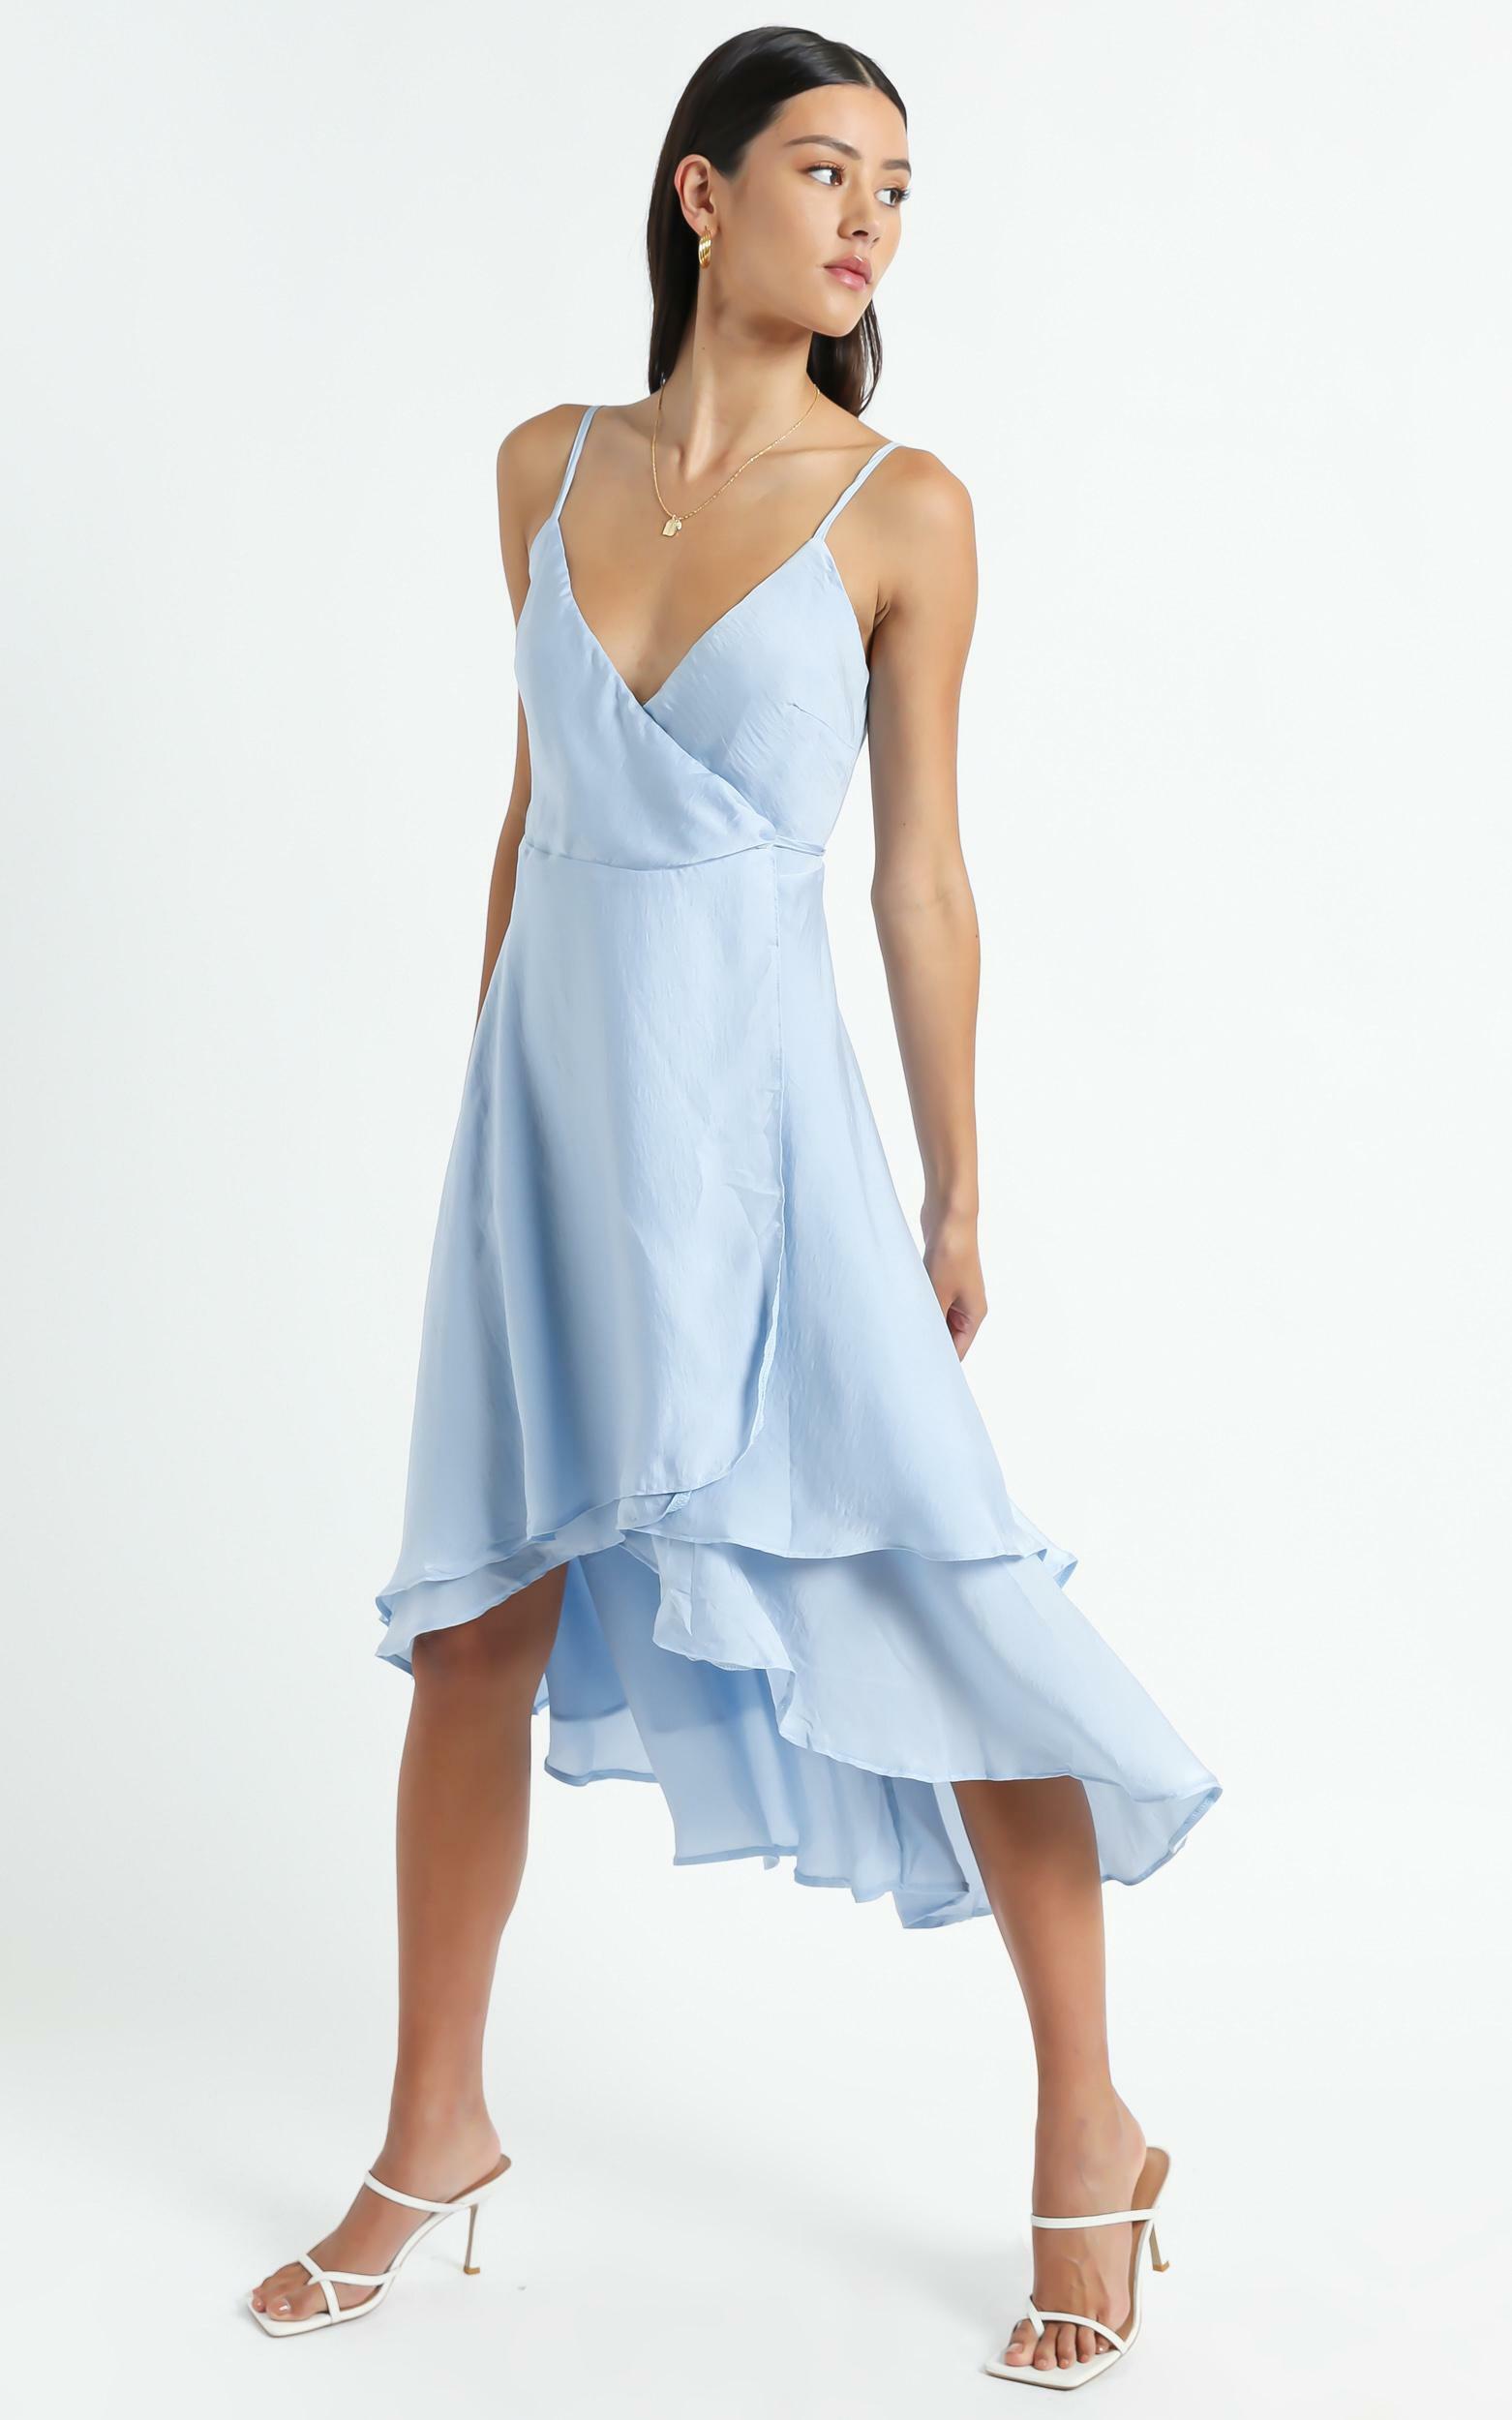 Between Fantasy Dress In Light Blue Satin - 6 (XS), BLU15, hi-res image number null